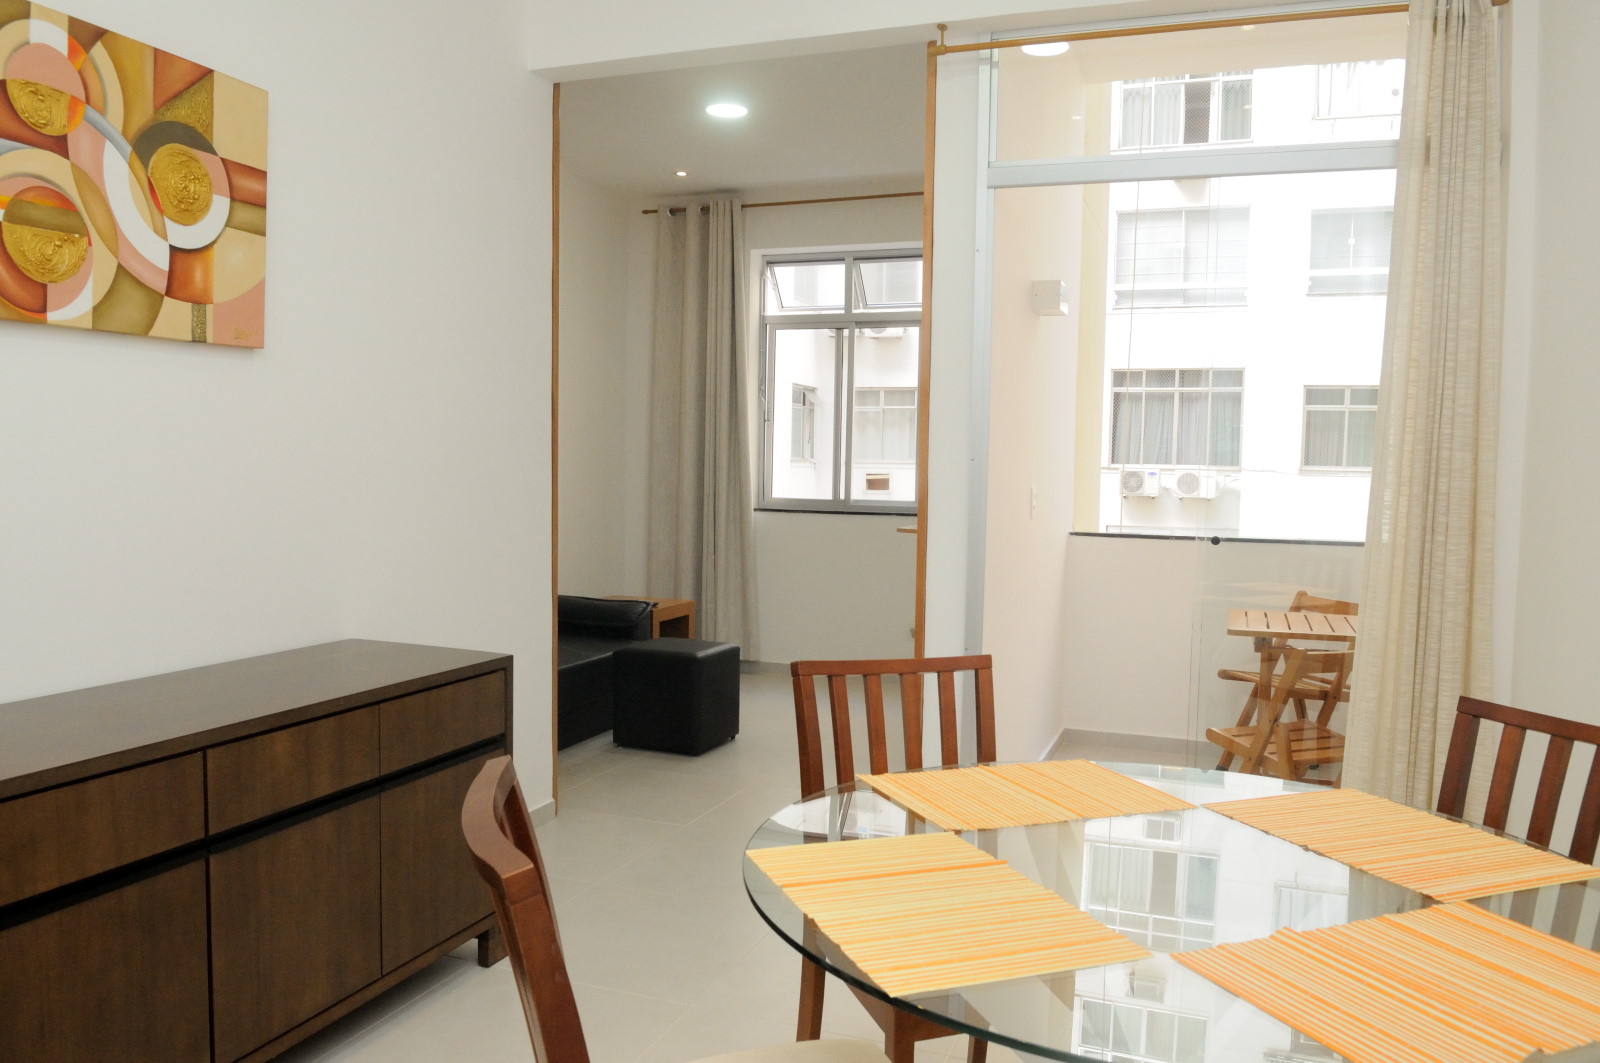 wohnung in rio de janeiro copacabana objekt nr 861 max 3 personen. Black Bedroom Furniture Sets. Home Design Ideas